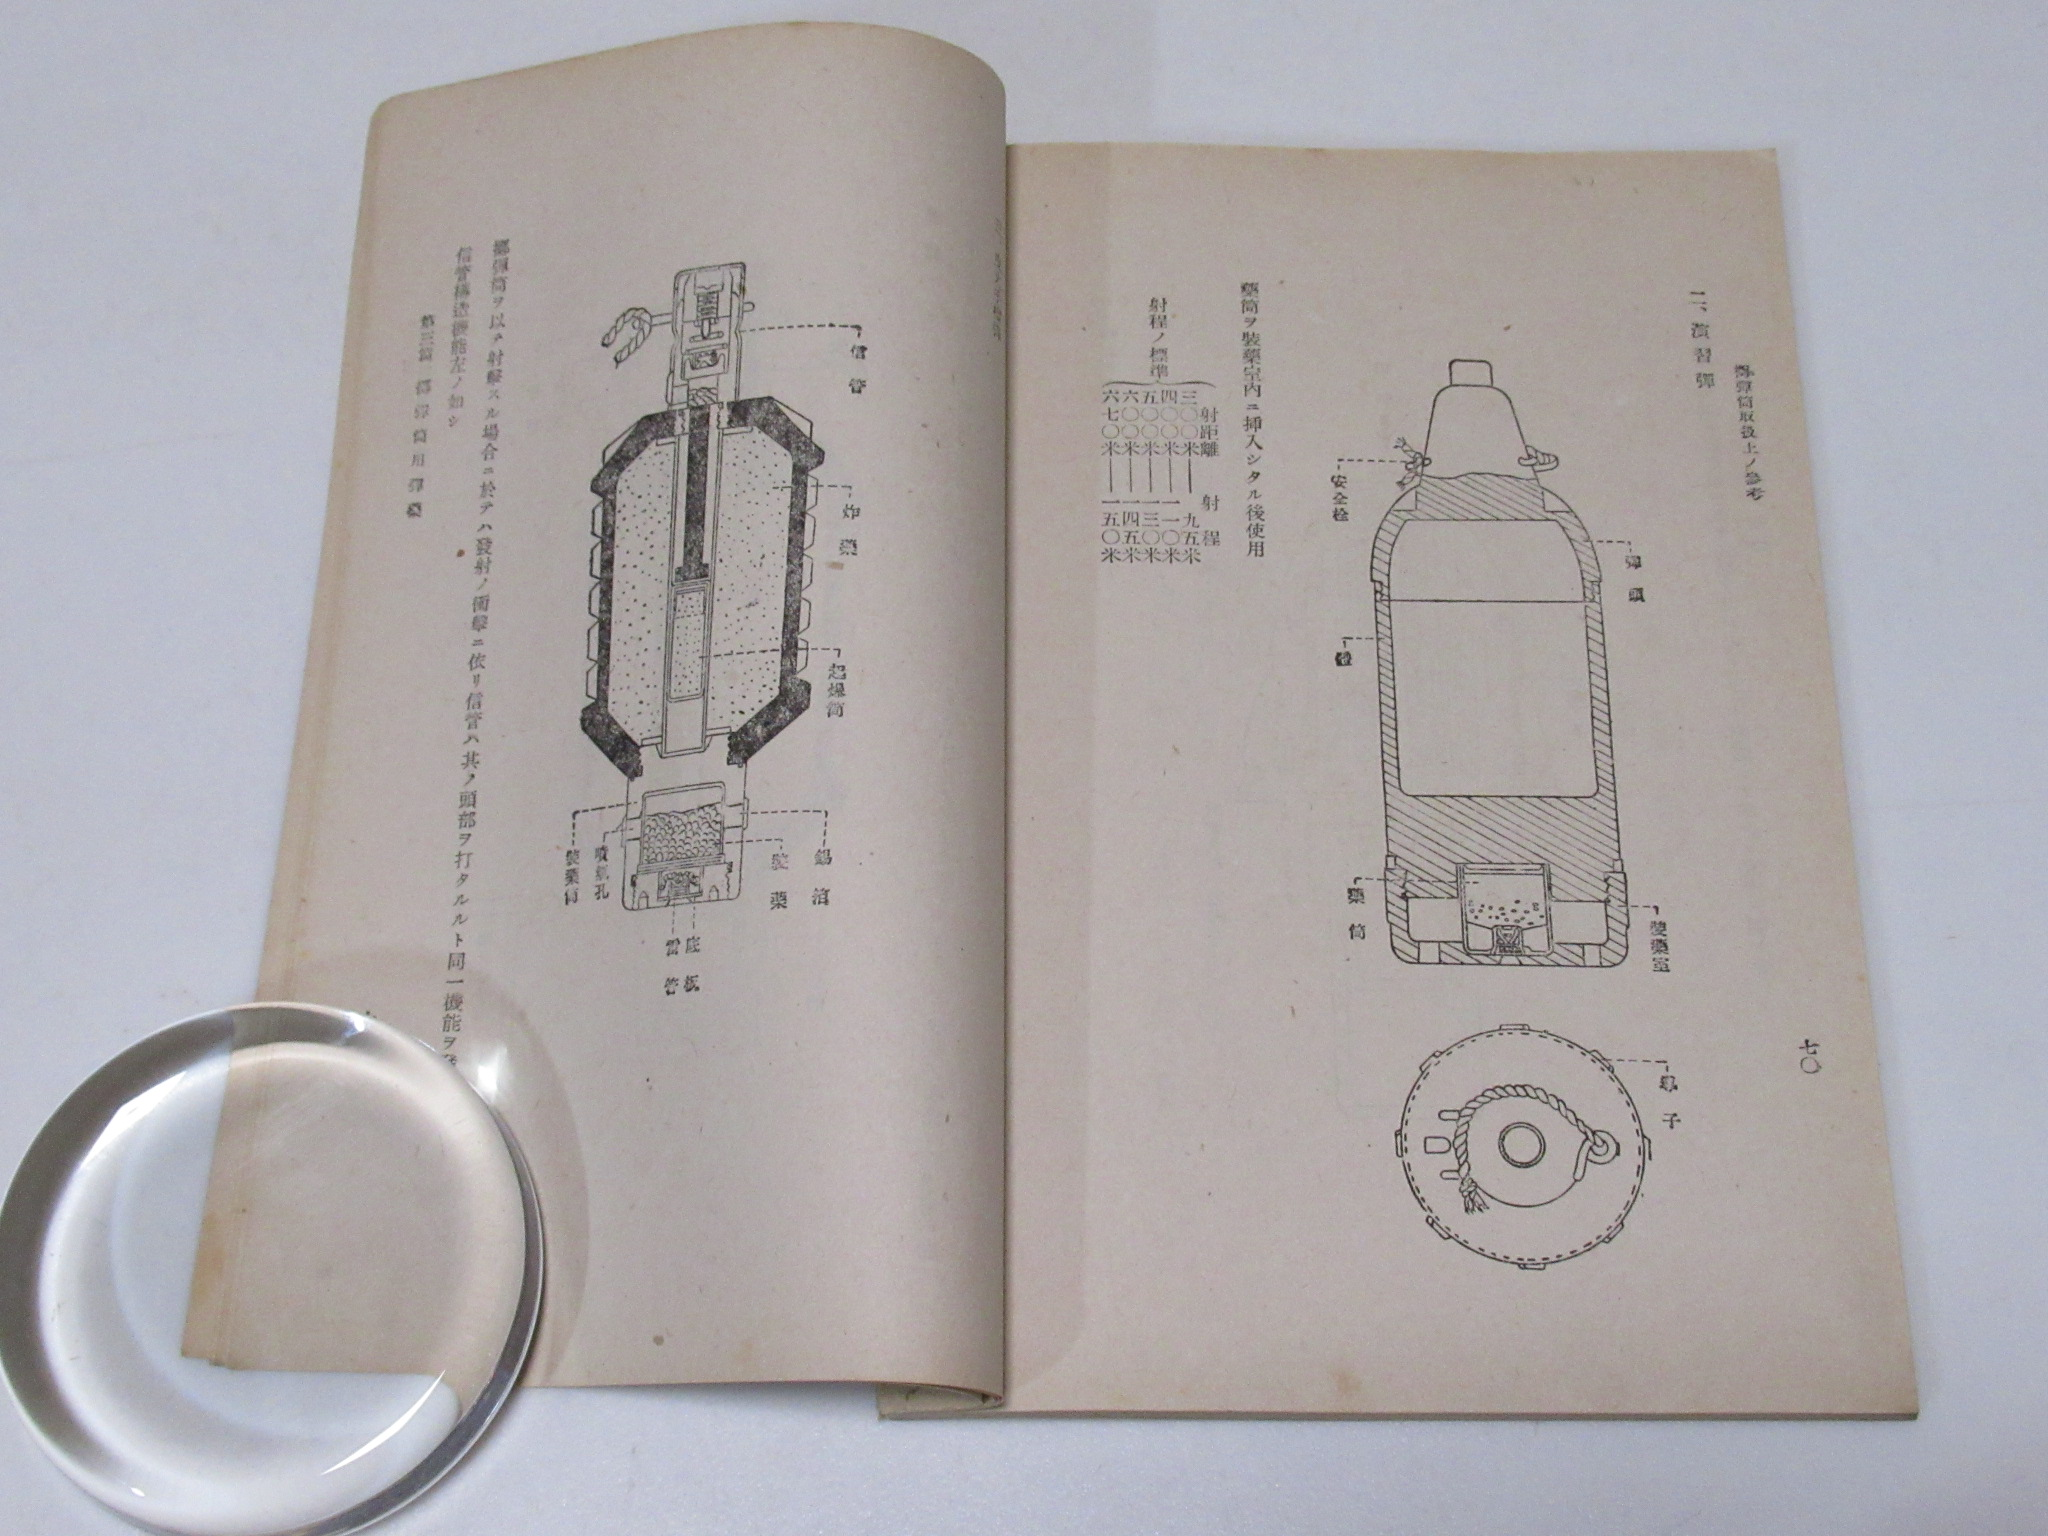 擲弾筒取扱上ノ参考 八九式重擲弾筒 十式擲弾筒 Type 89 10 grenade discharger operating manual